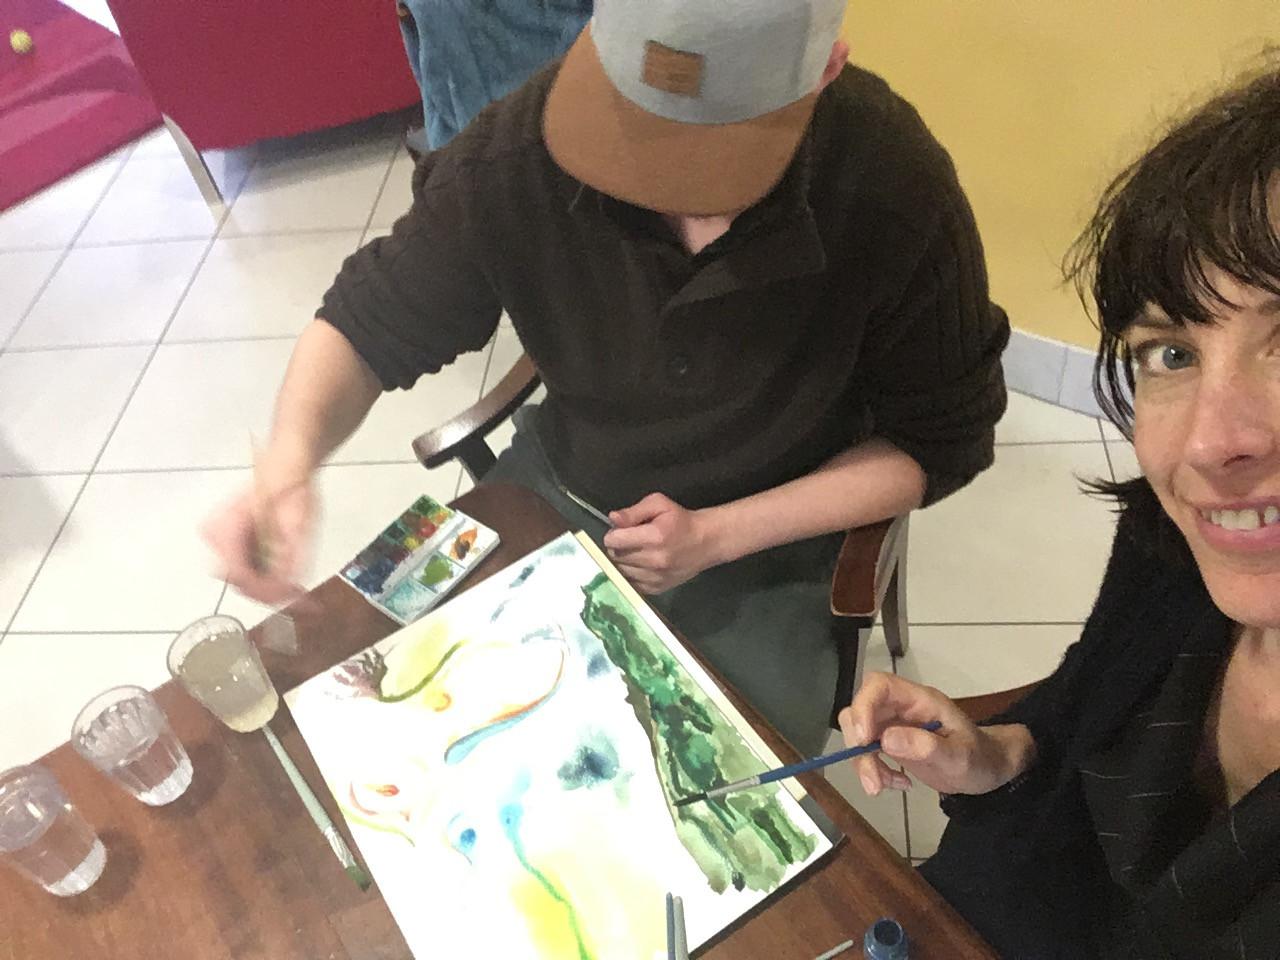 collaboration art making